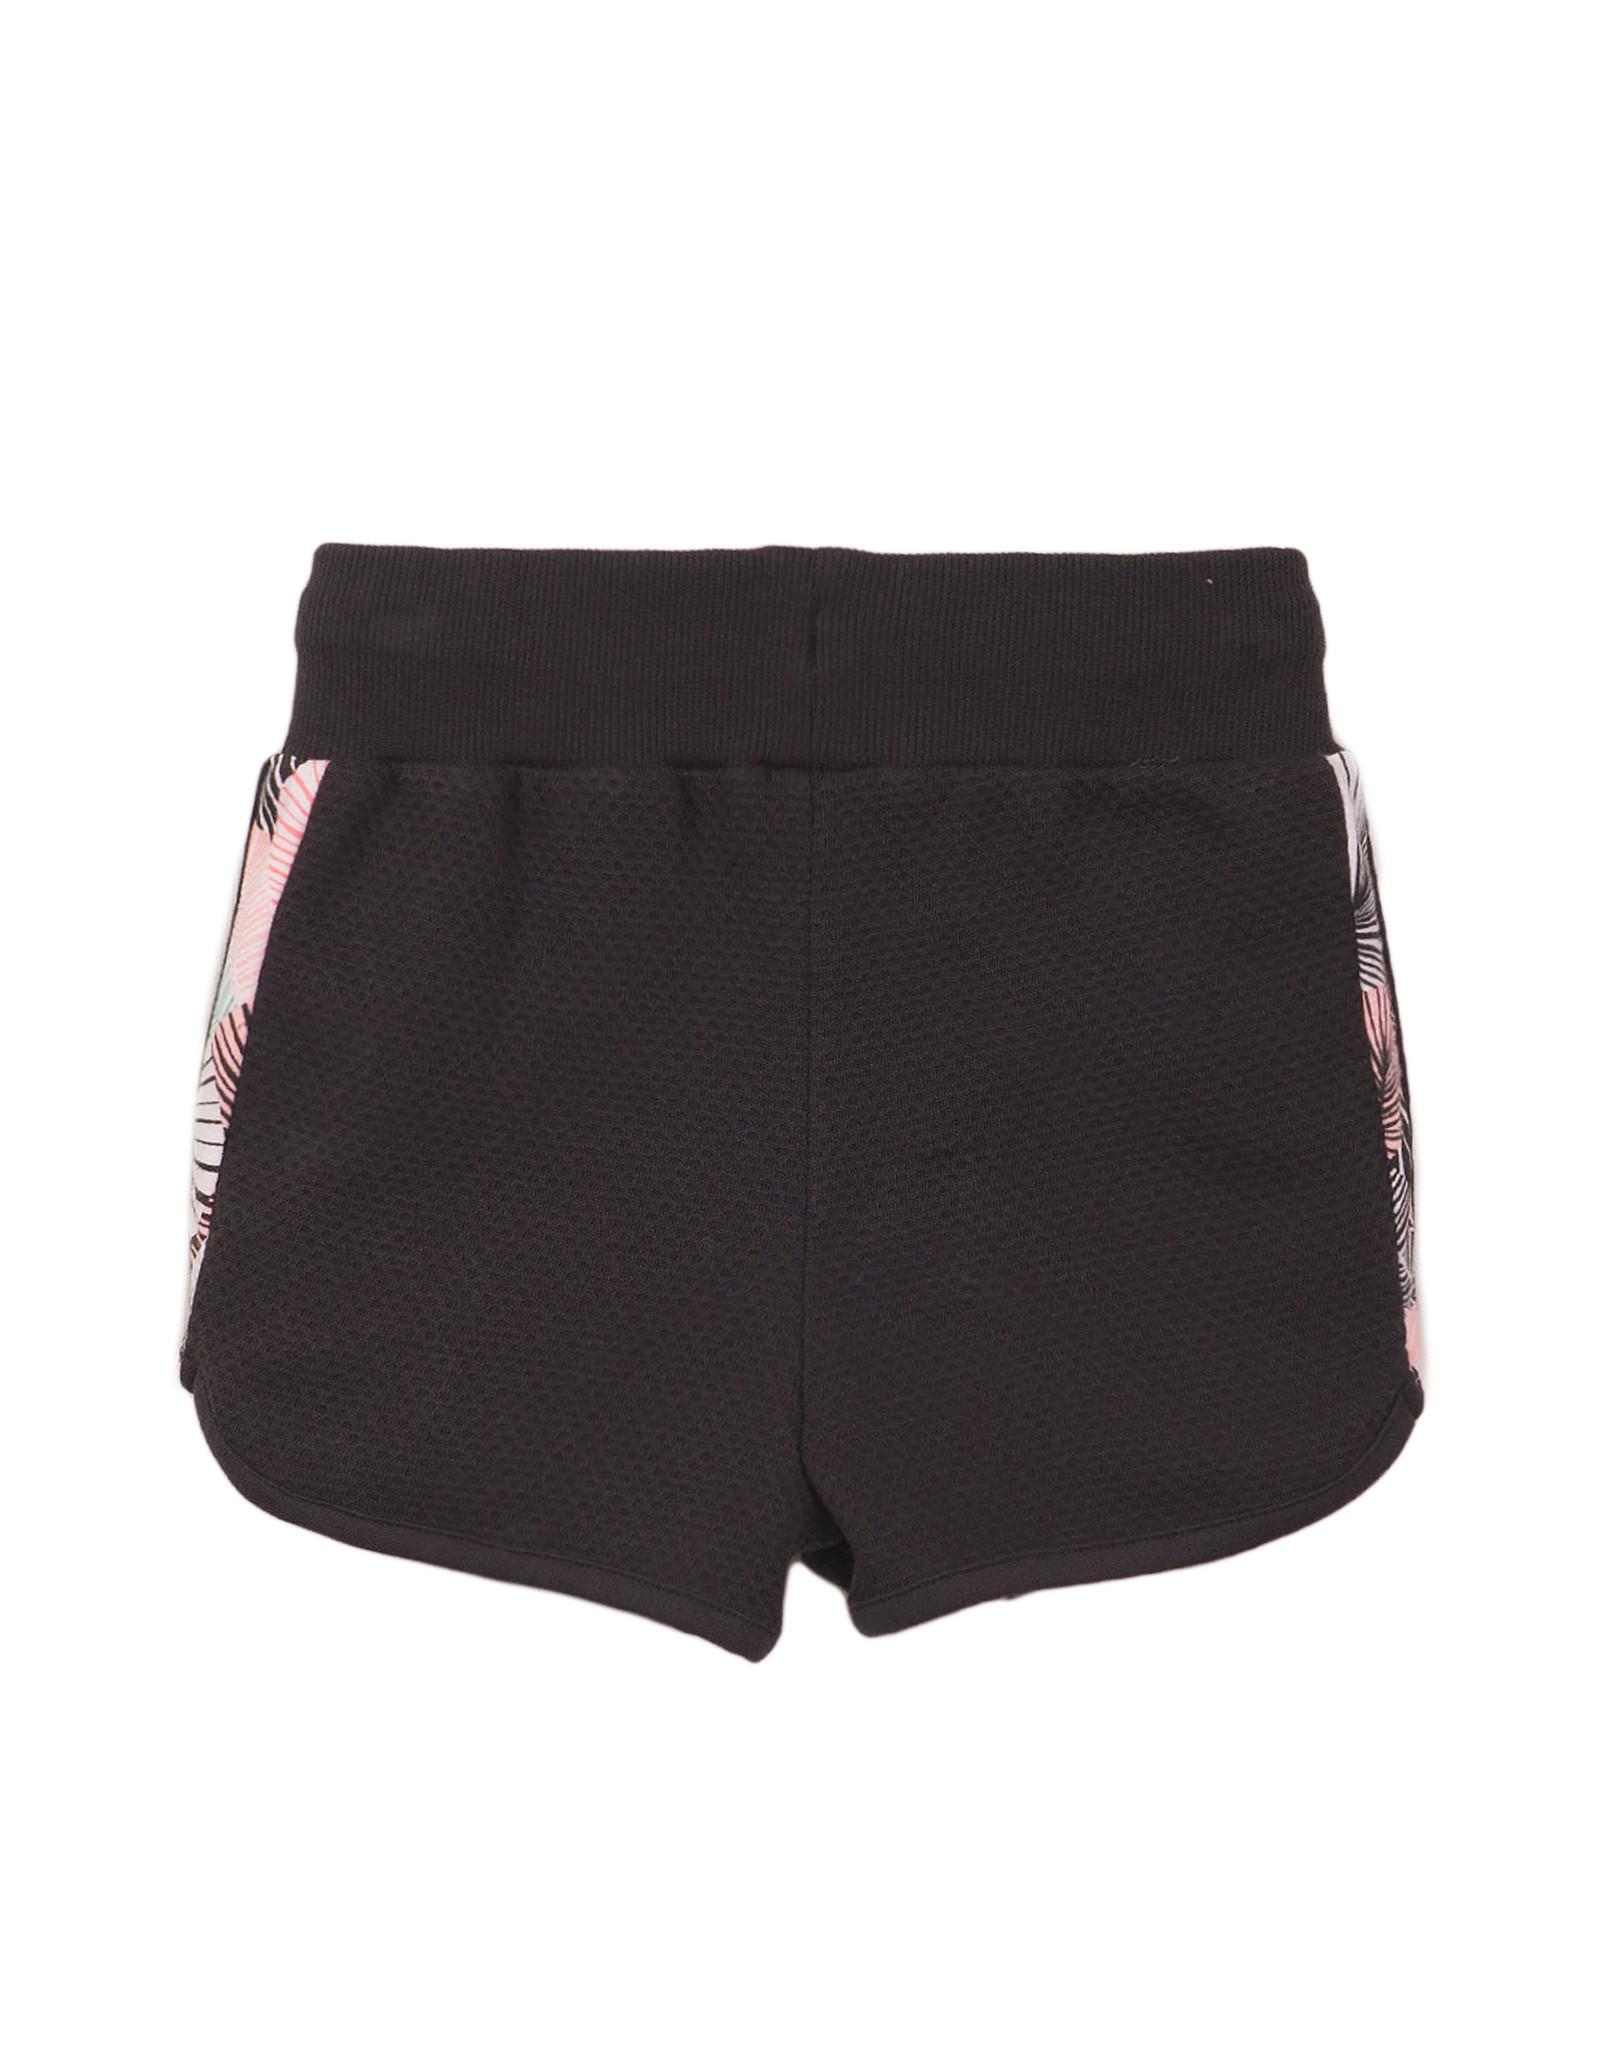 Dutch Jeans Short, Anthracite